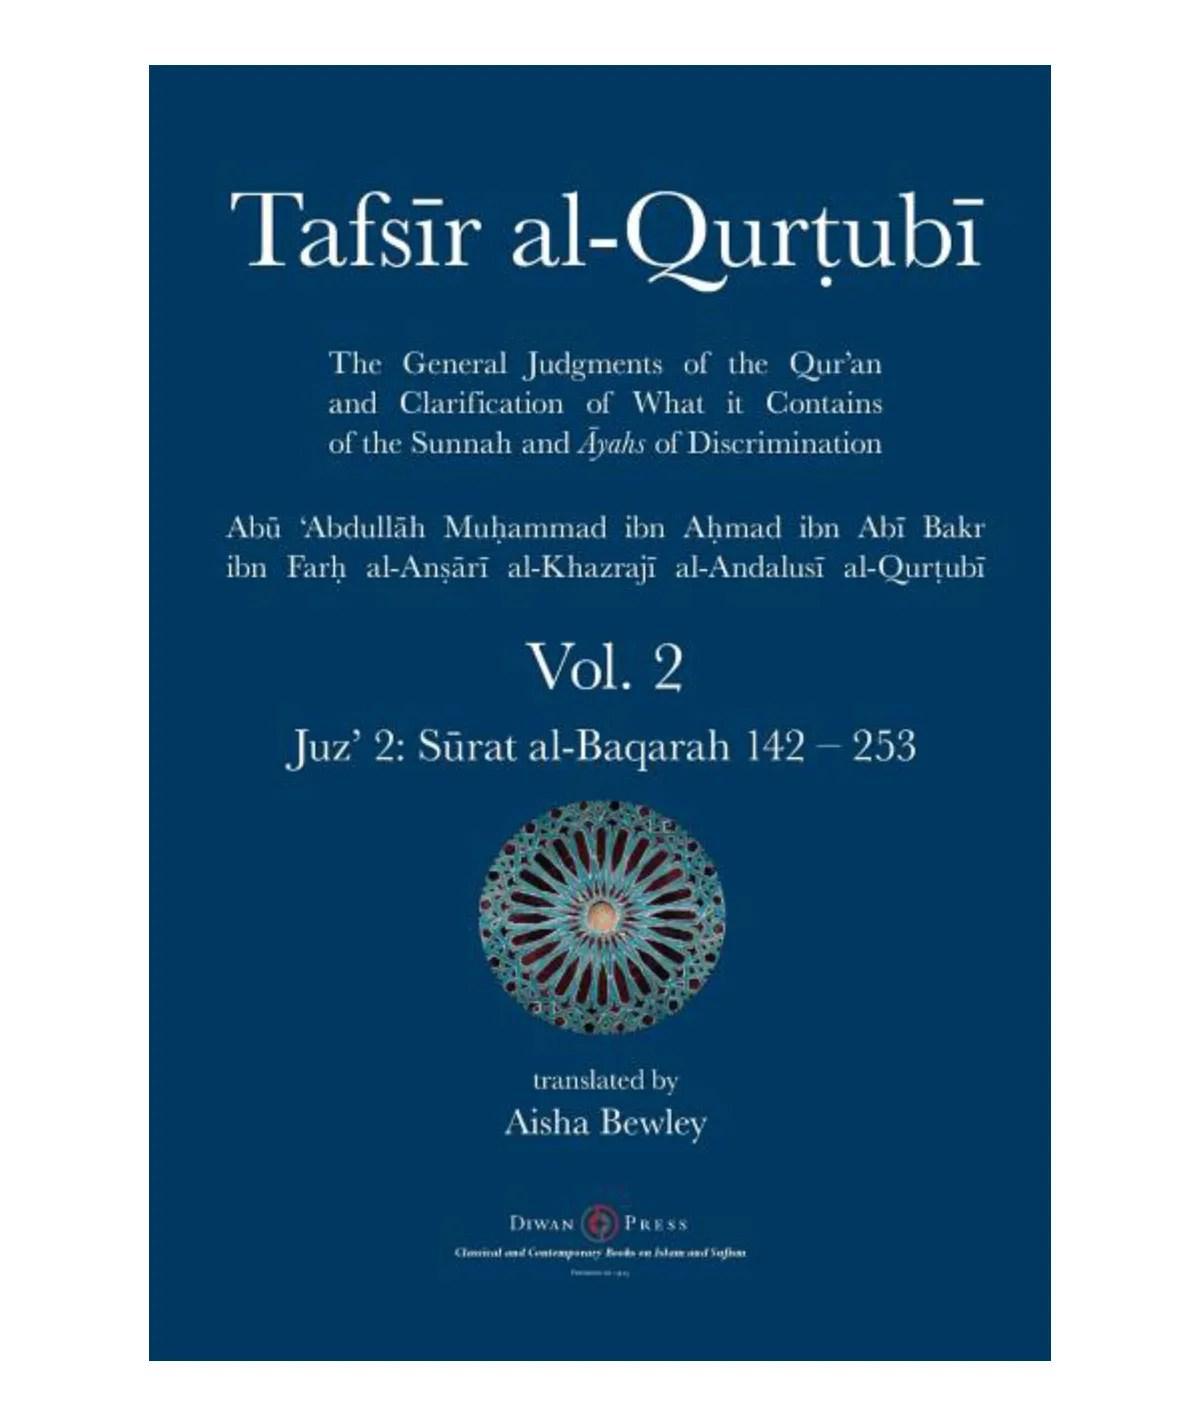 Tafsir al-Qurtubi Vol. 2: Juz' 2: Sūrat al-Baqarah 142 - 253: Al-Qurtubi, Abu 'abdullah Muhammad | Bewley, Aisha Abdurrahman | Bewley, Abdalhaqq